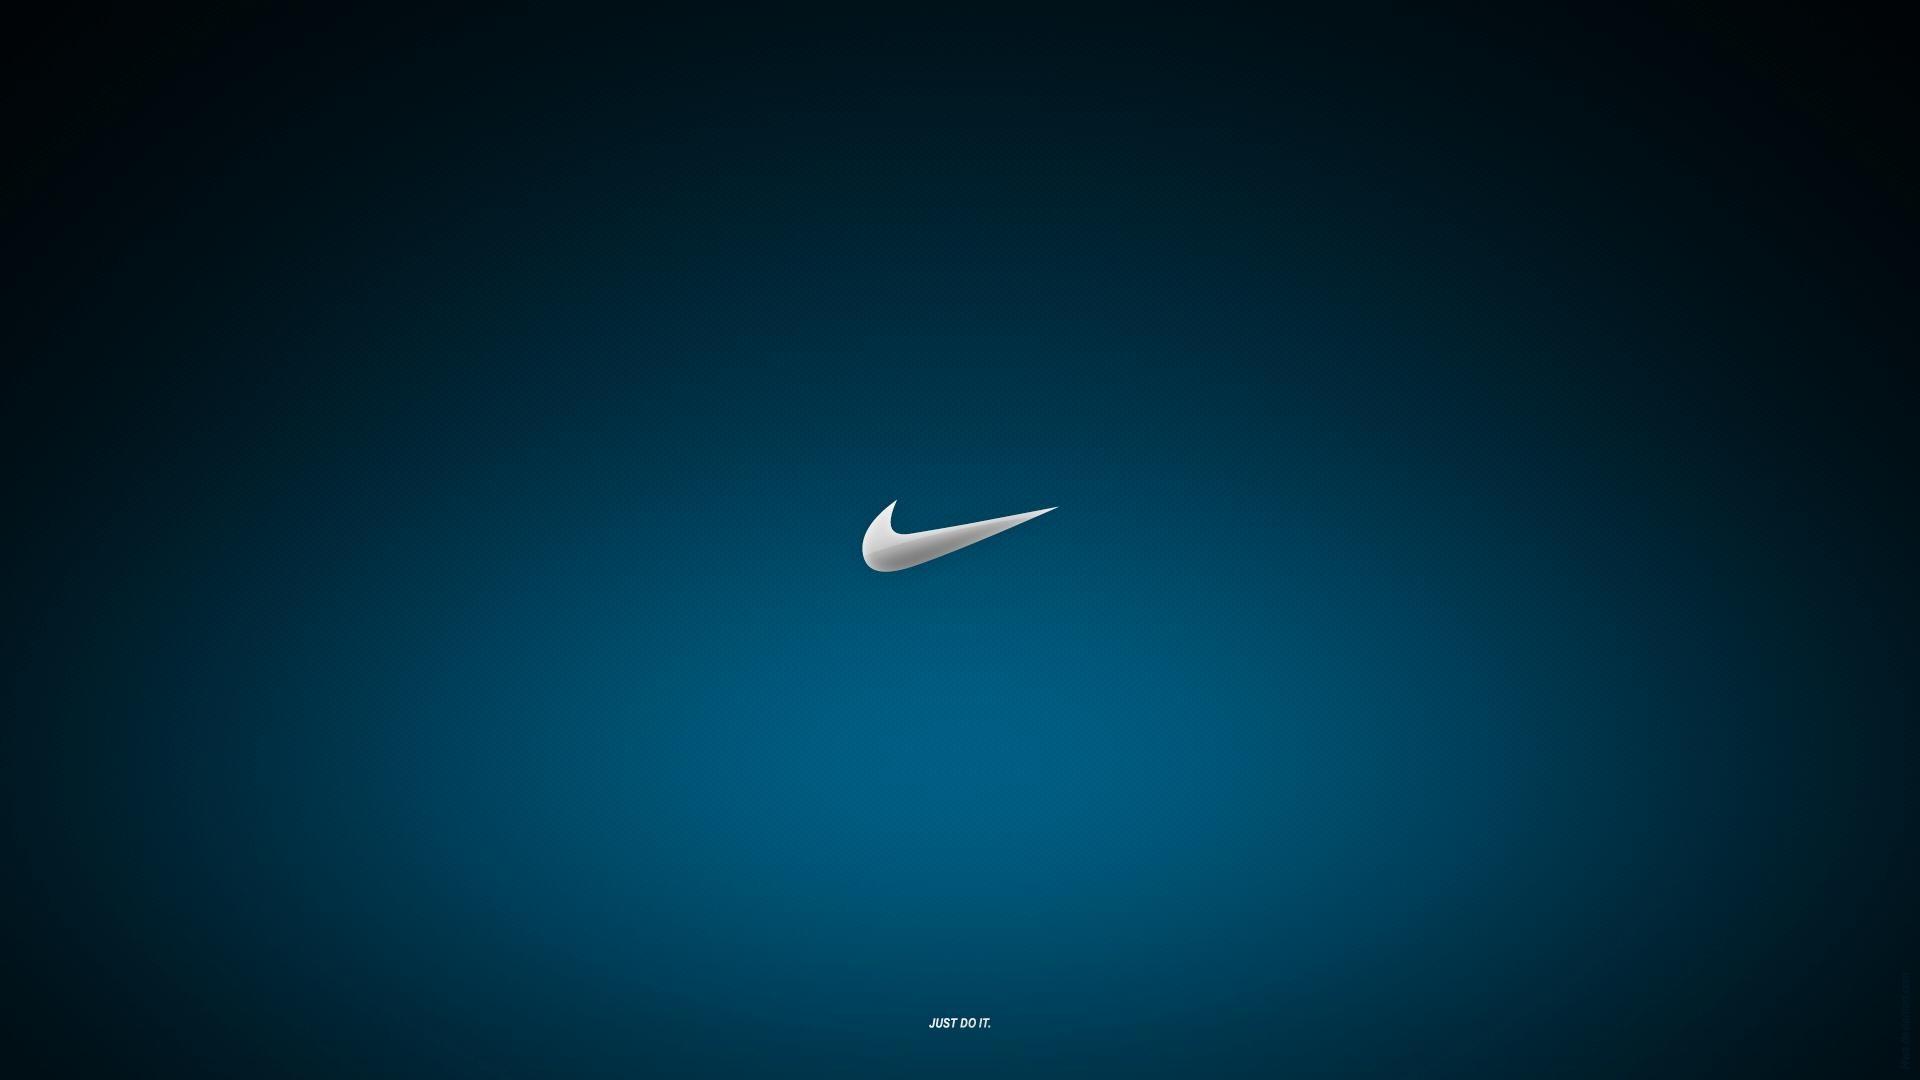 Cool Nike Wallpaper (65+ images)